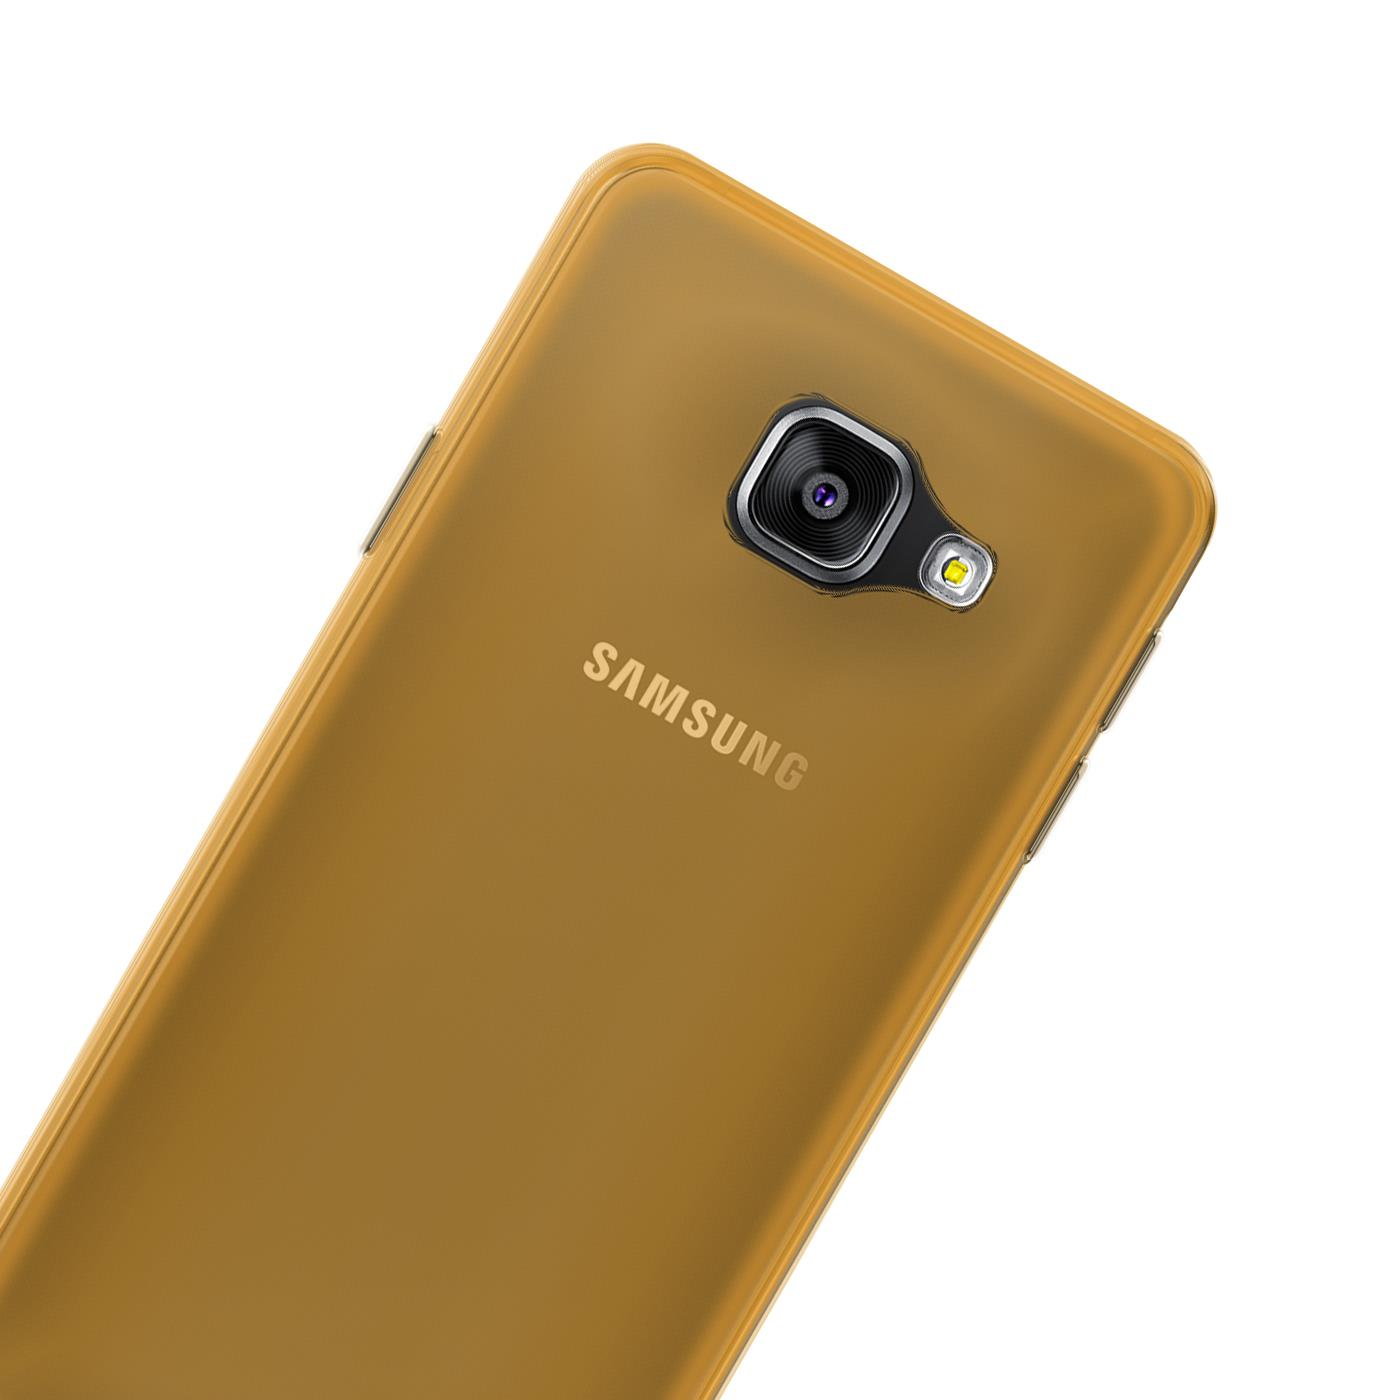 Samsung-Galaxy-a3-2016-Thin-Silikon-Klar-Case-Cover-Ultra-Slim-Stossfeste-Gel Indexbild 18